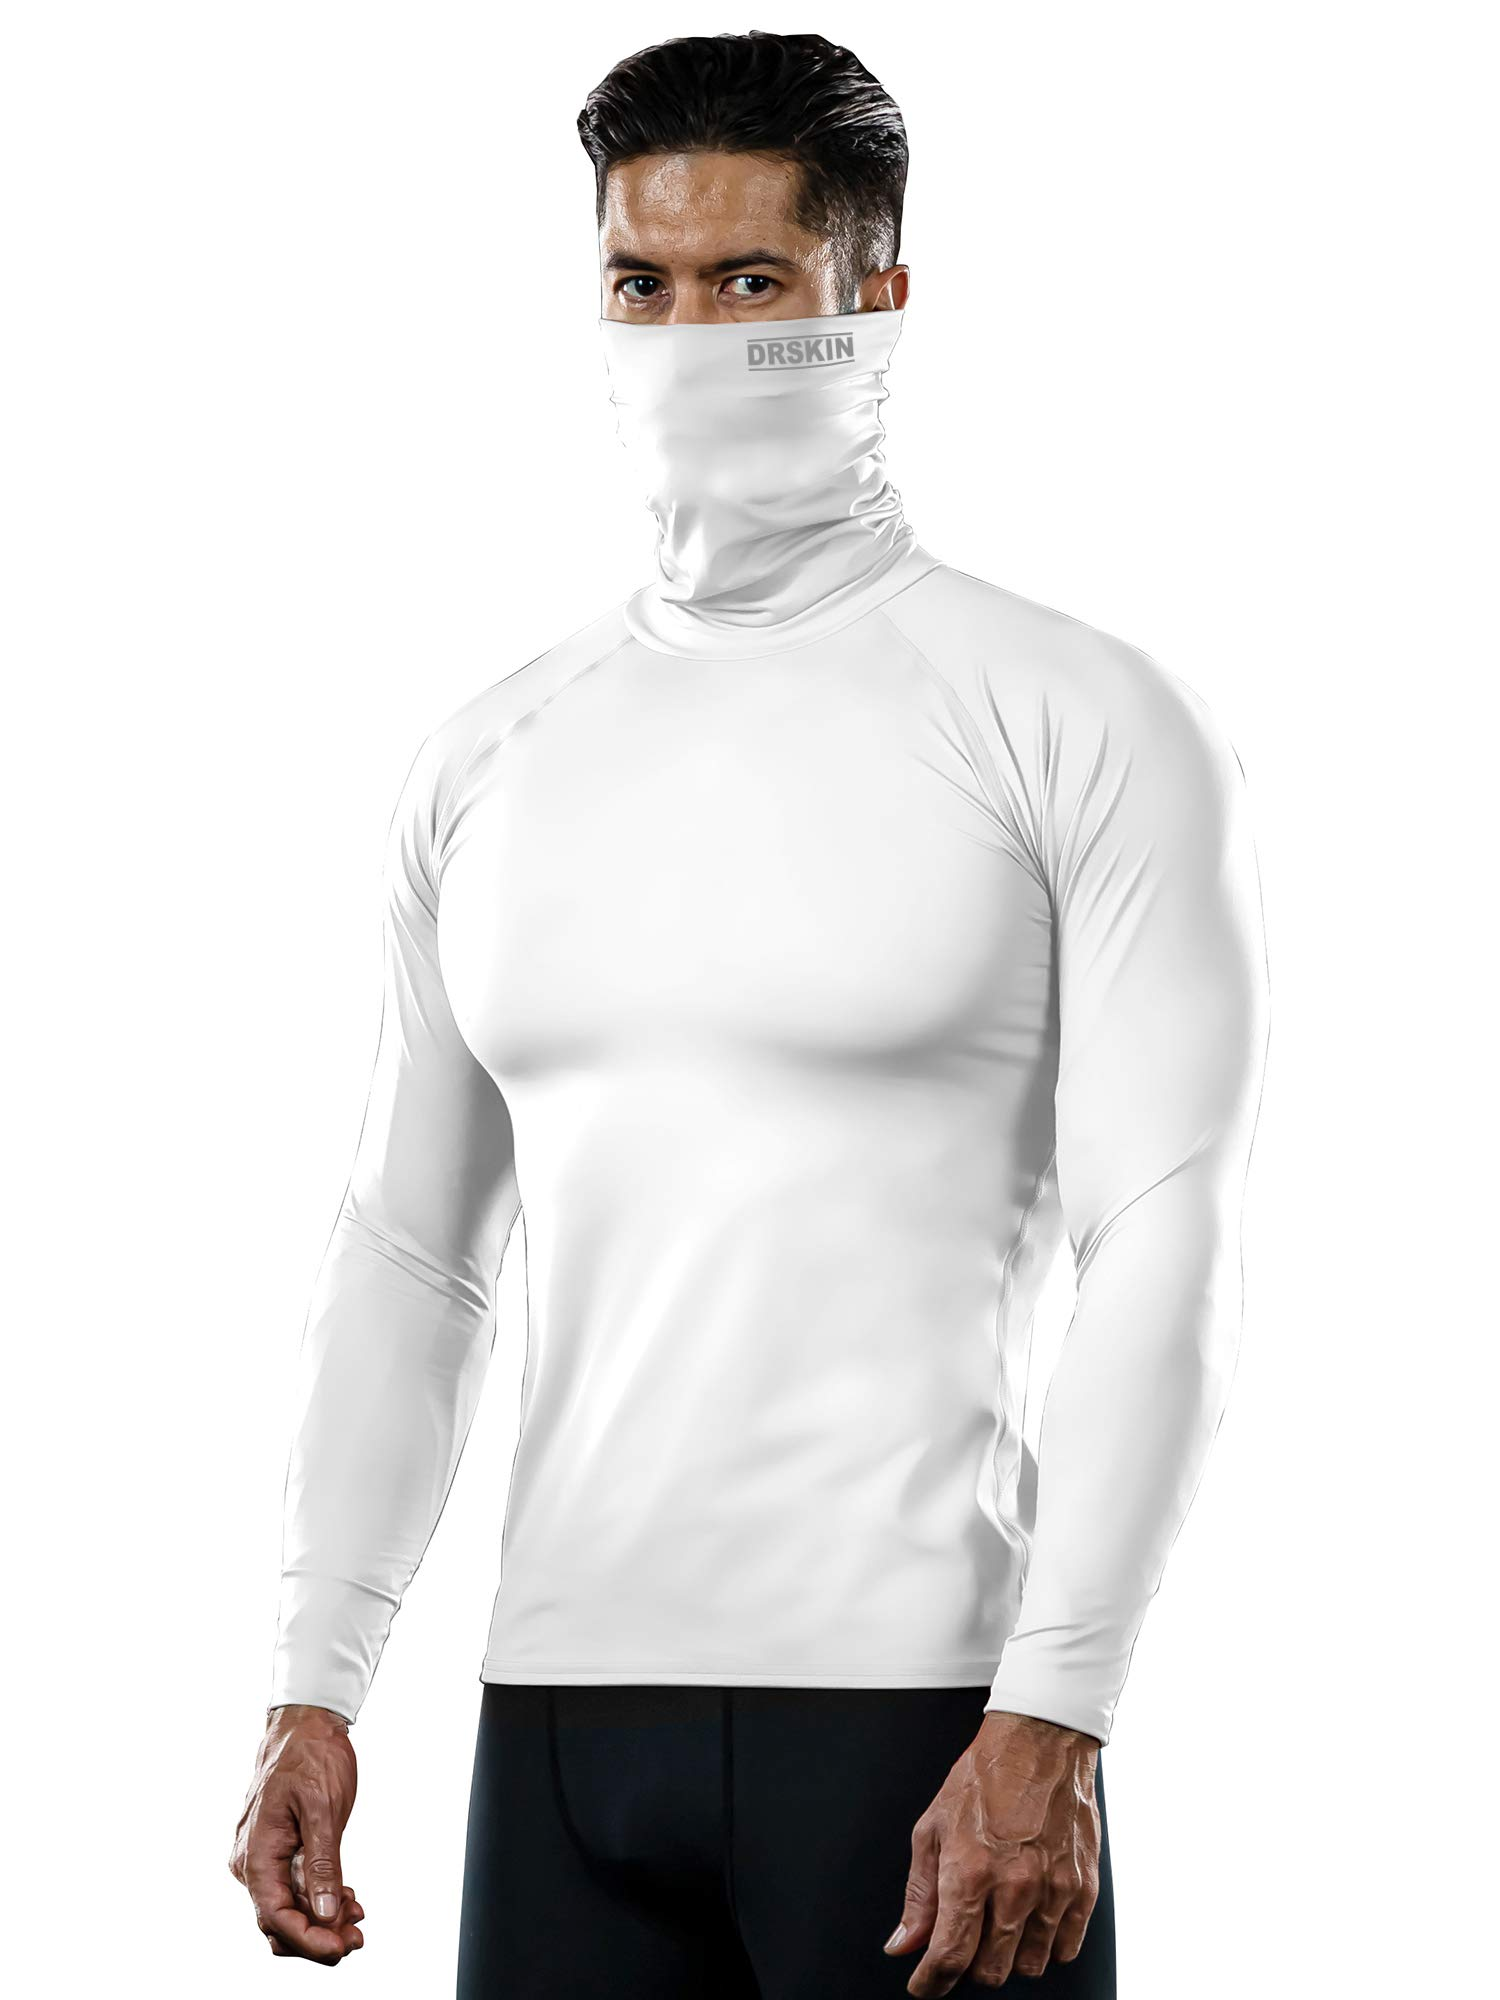 DRSKIN MASK Shirts Turtleneck Compression Top Cool Dry Sports Shirt Baselayer Running Long Sleeve Men